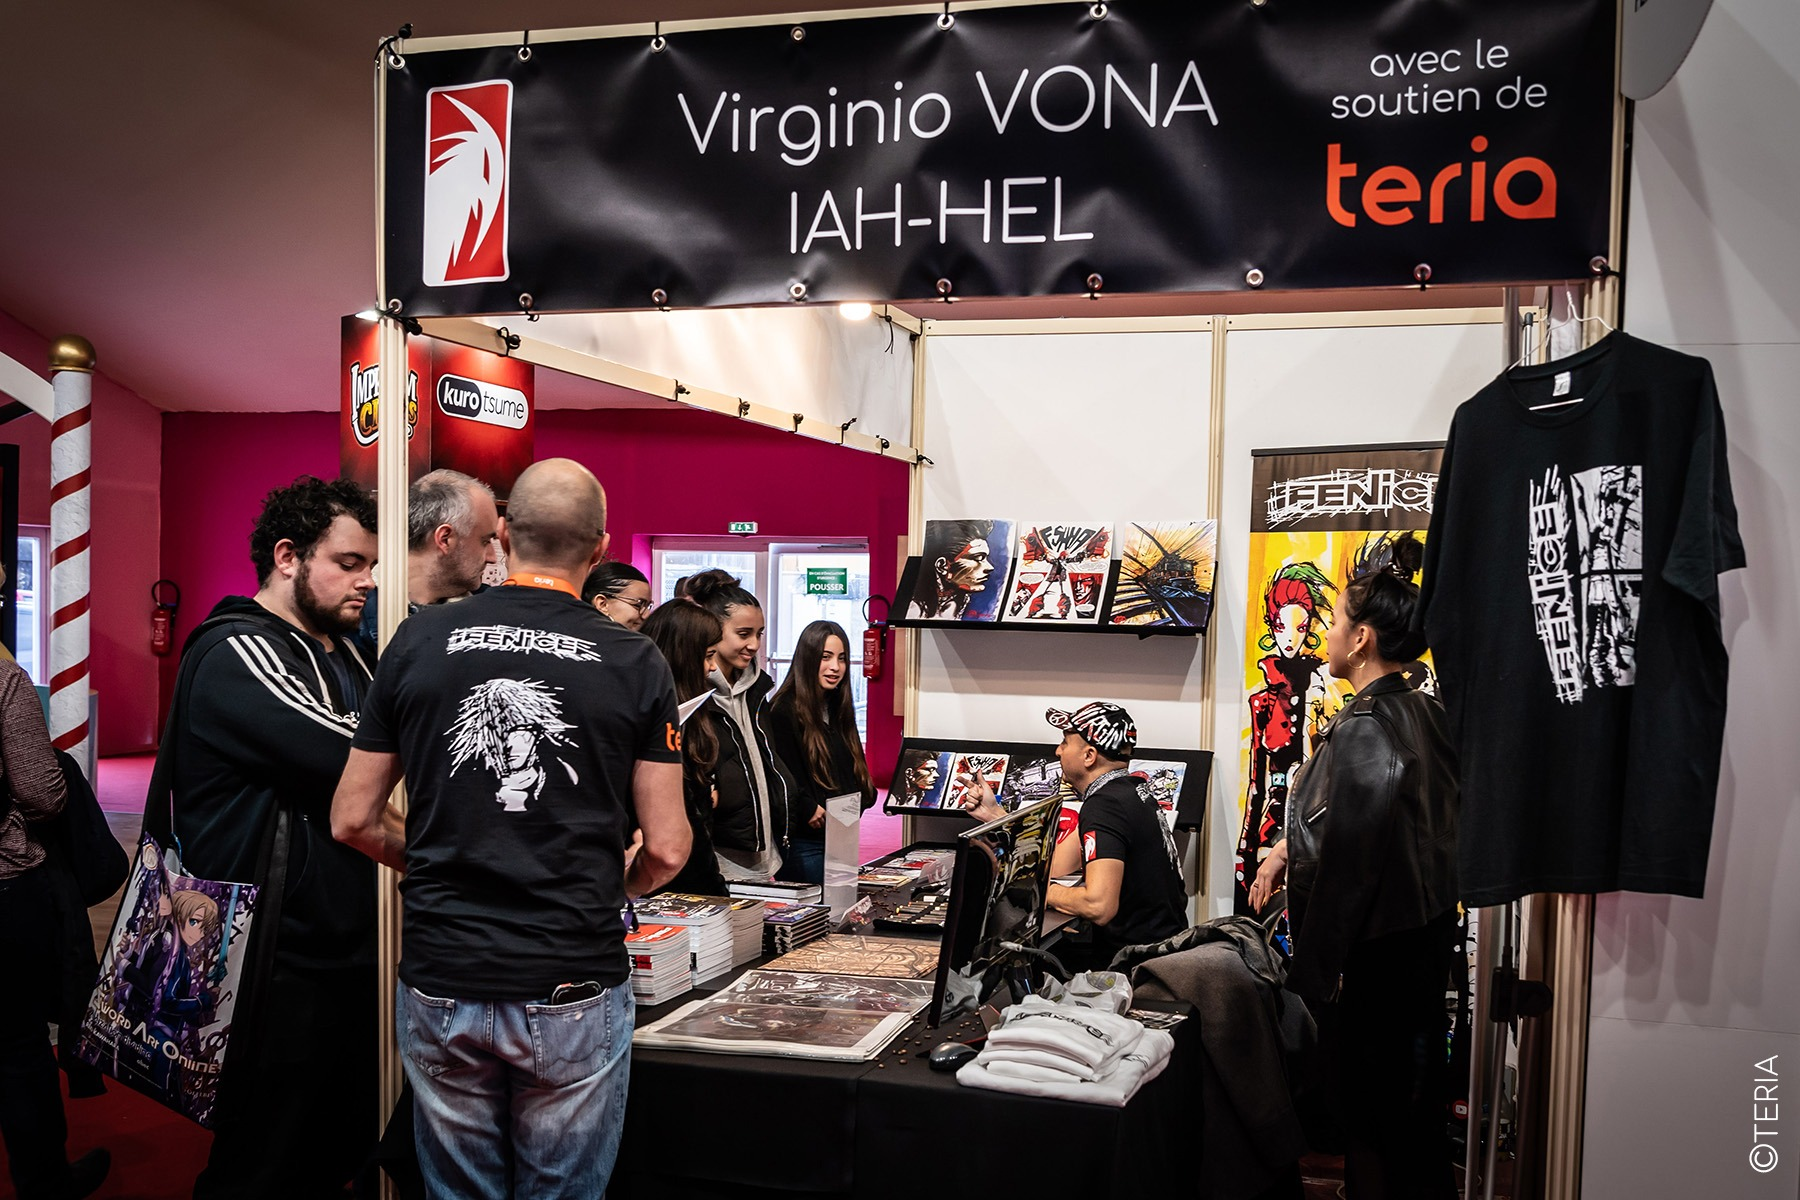 L'artiste Virginio VONA x TERIA au Festival de la bande dessinée d'Angoulême